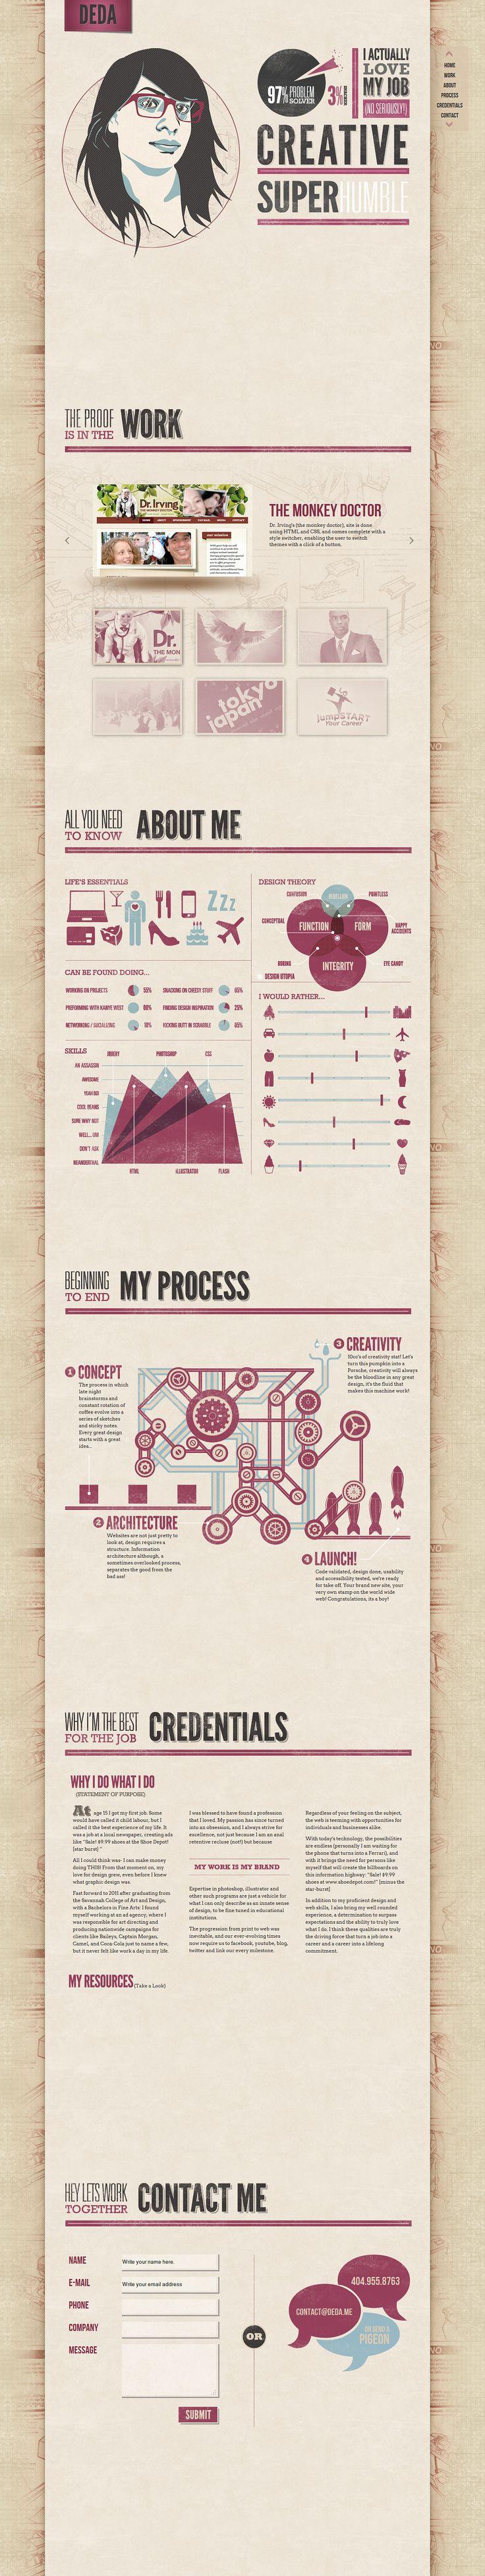 Creative Website Design - Personal Portfolio!